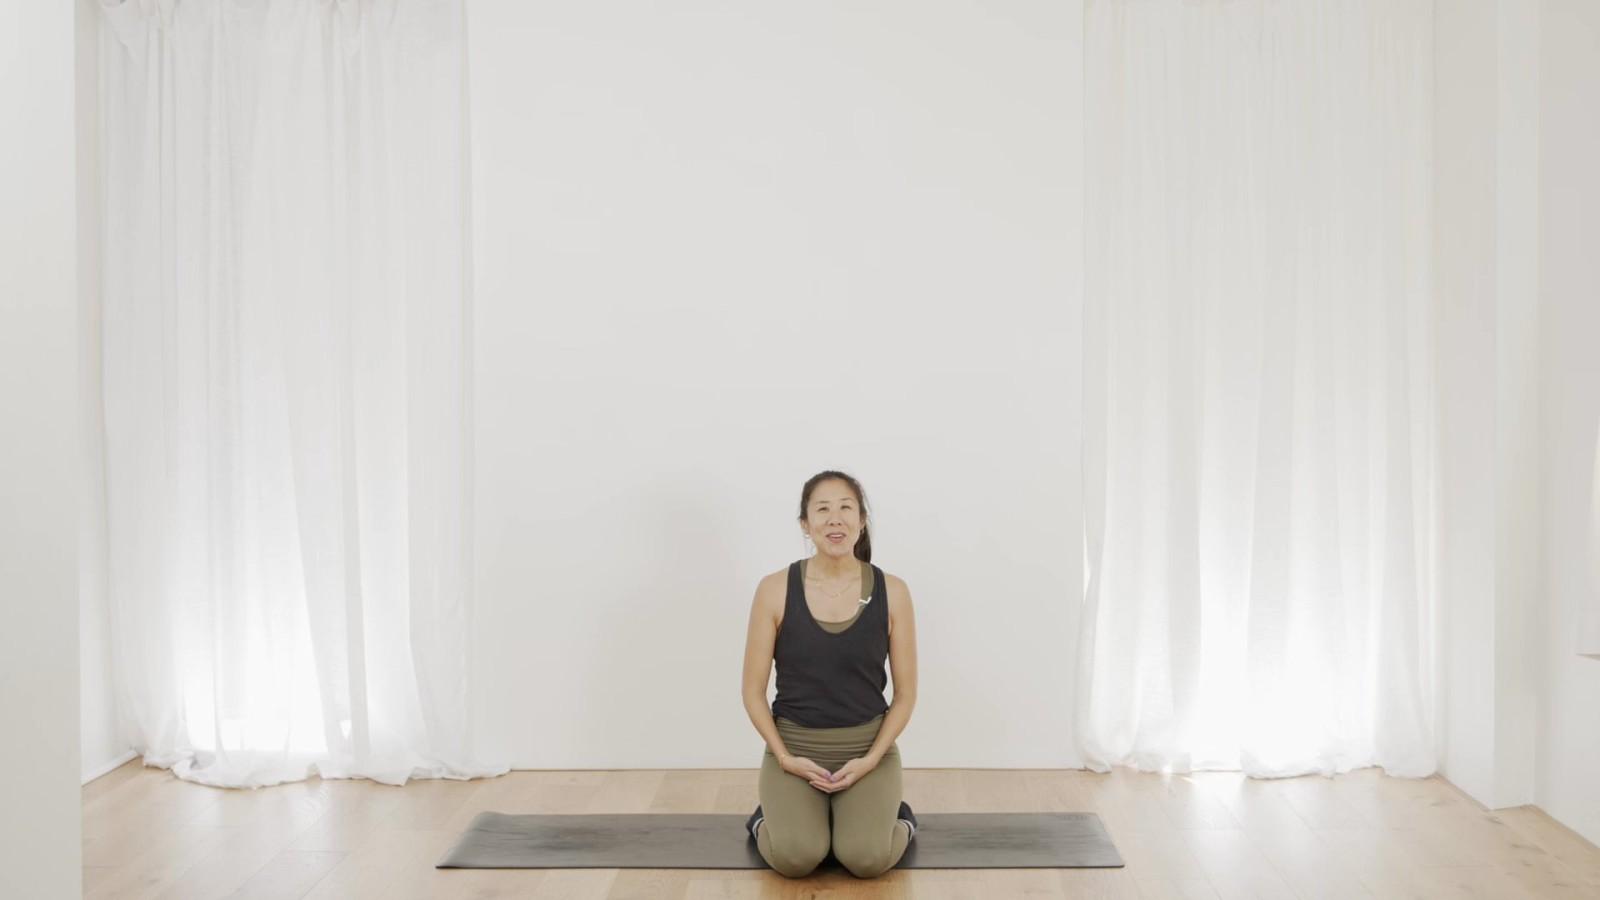 Meditation : acceptance mindset with Leanne Raab